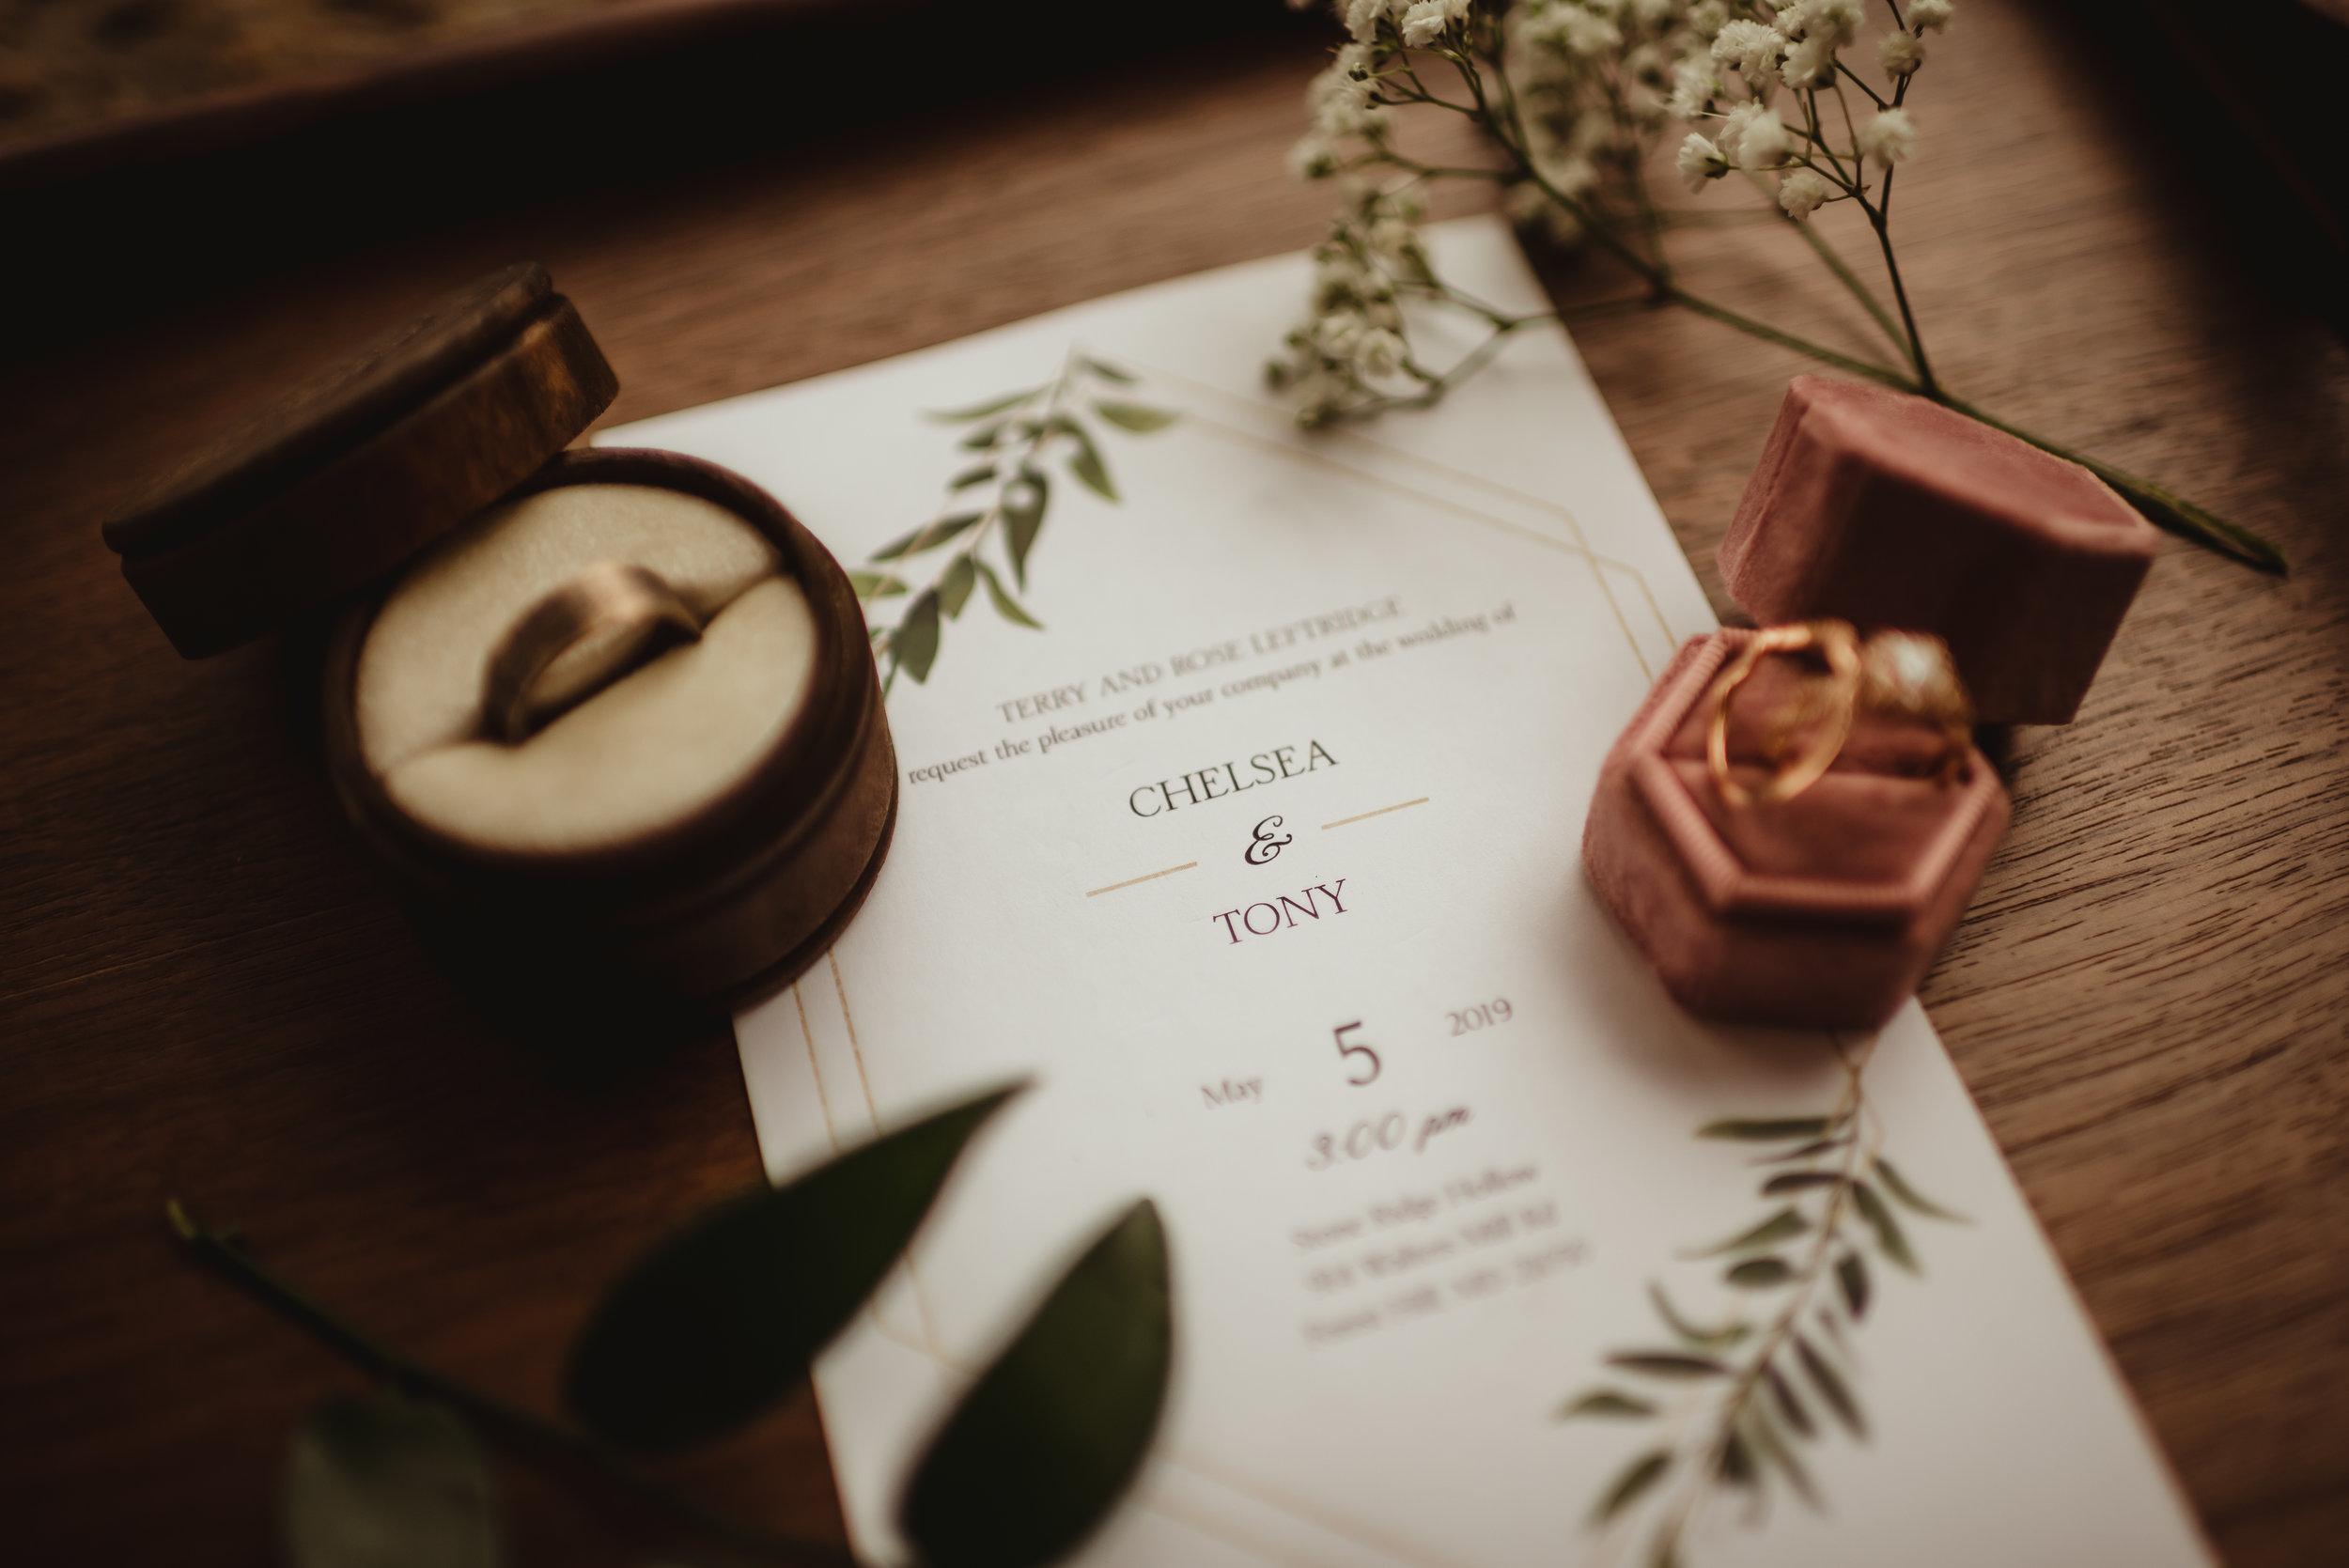 brittney-nestle-photo-wedding-collection-includes.jpg